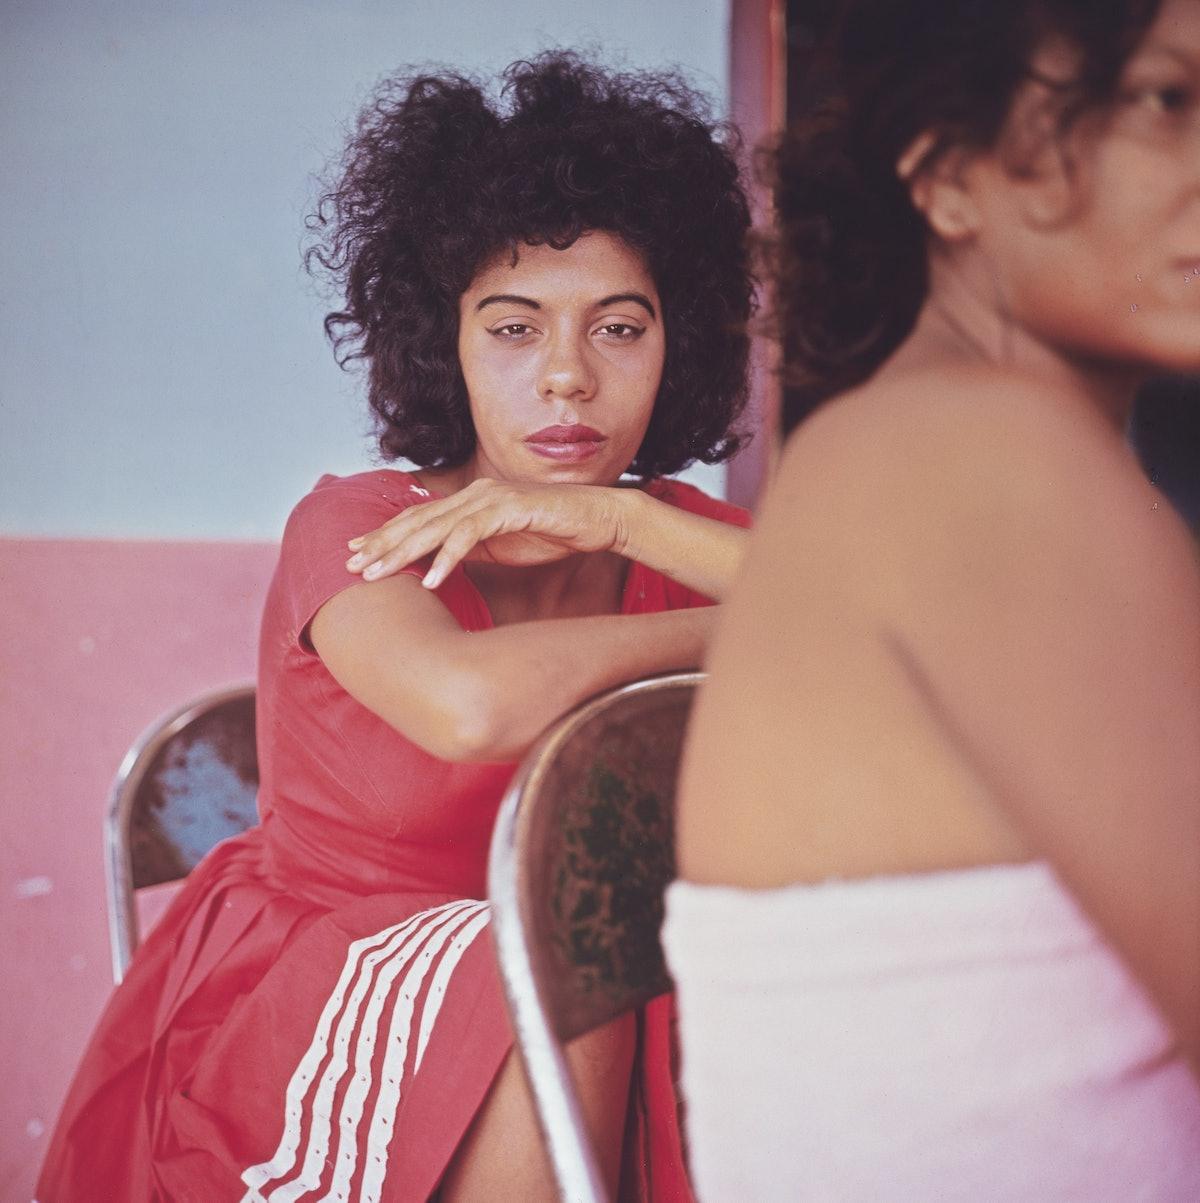 16_Tesca Cartagena Columbia.jpg